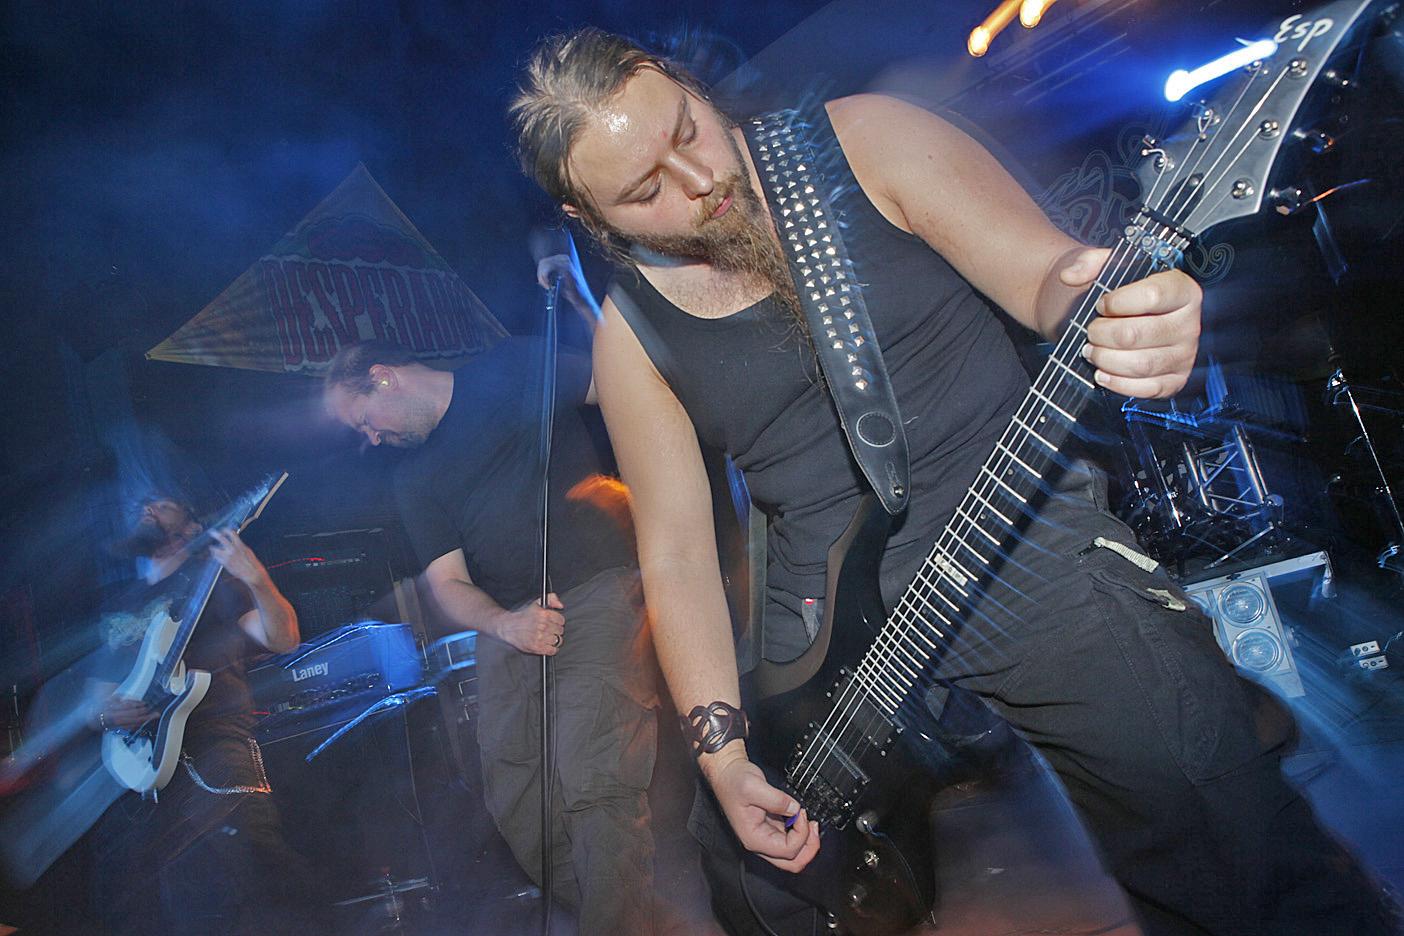 Saturnus live, 28.09.2013, Erfurt: From Hell